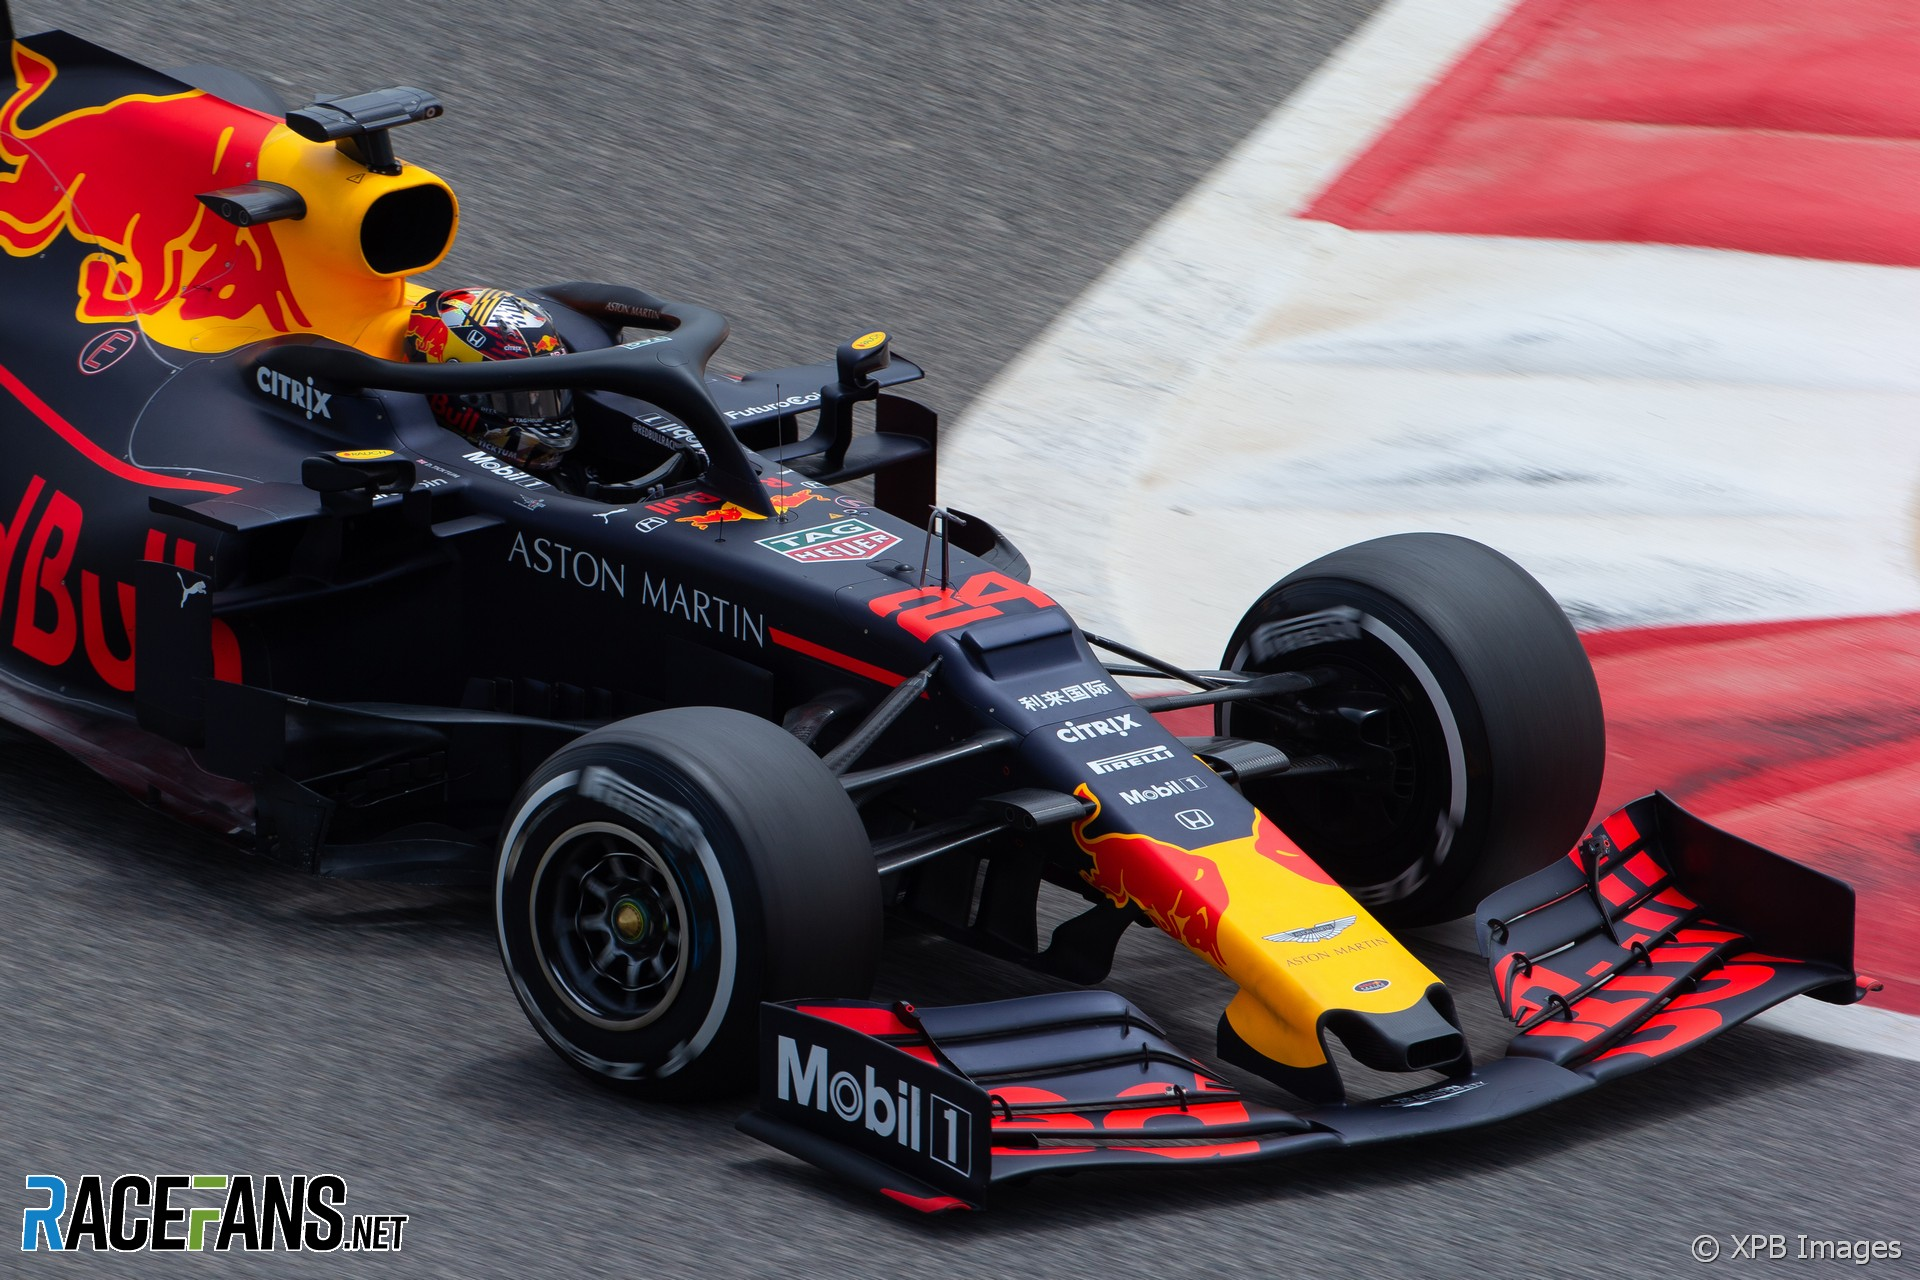 F1technical.net